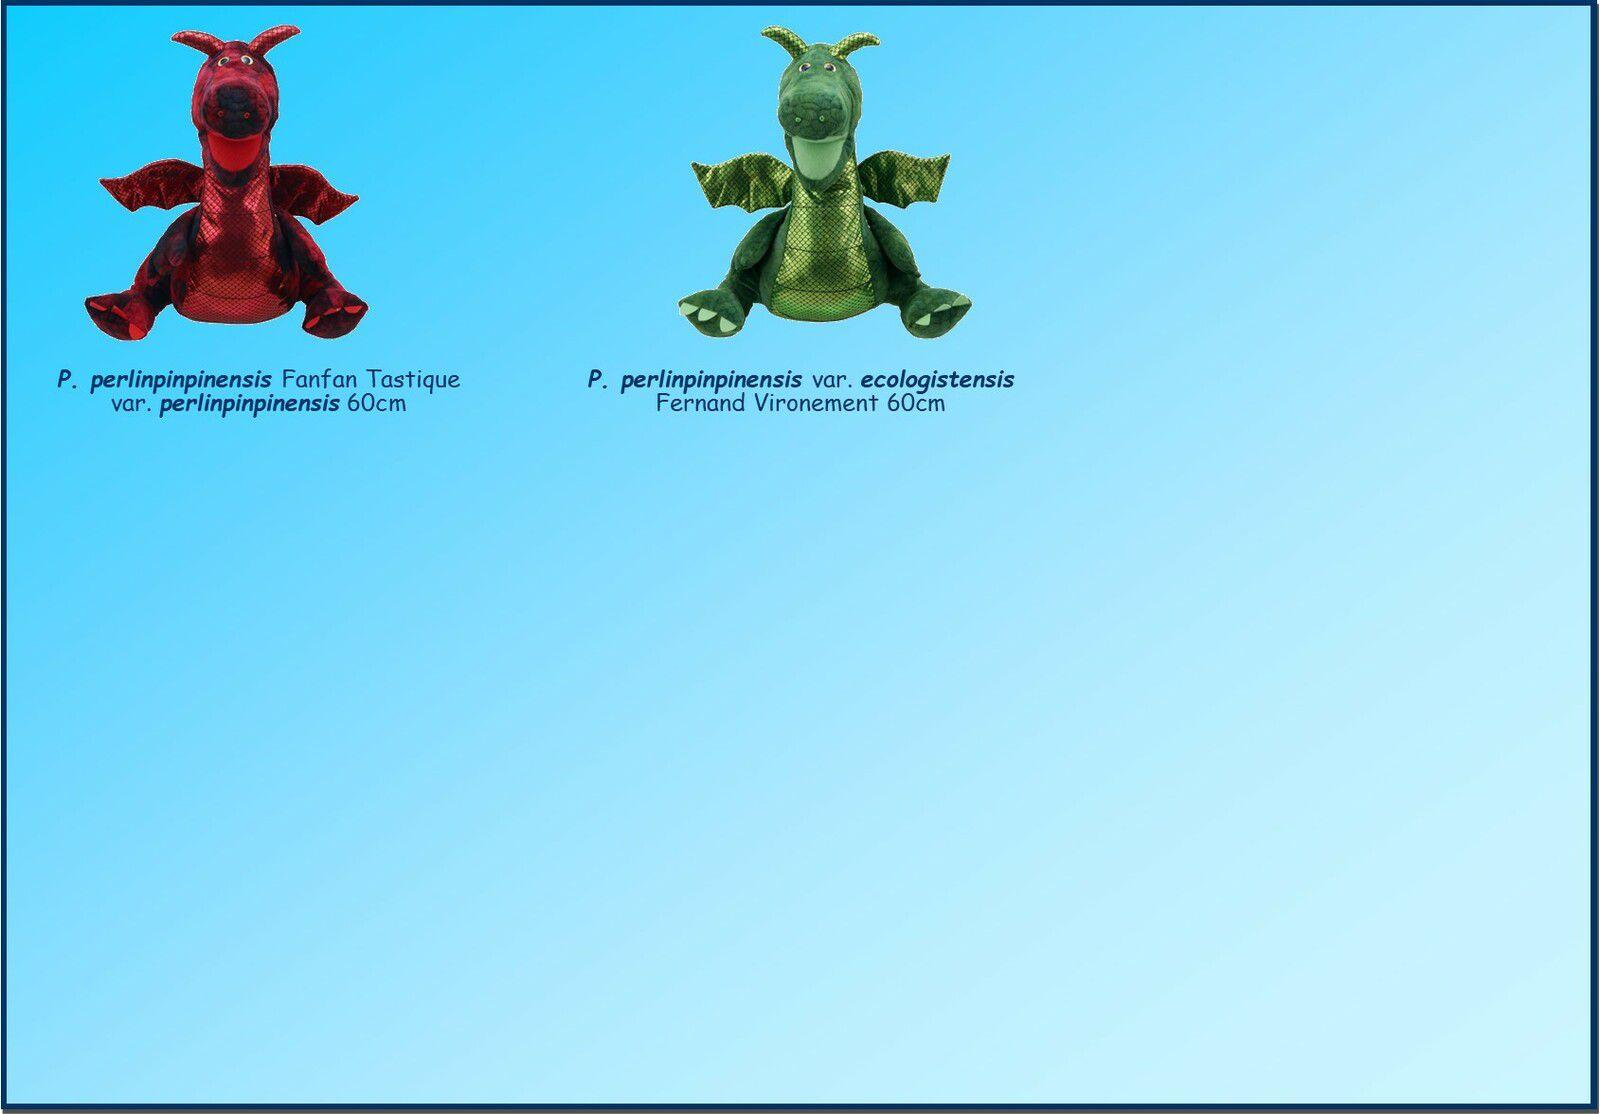 MUSEE PHILIBERT DRAGONNEAU : 1 Collection de Peluches Dragon